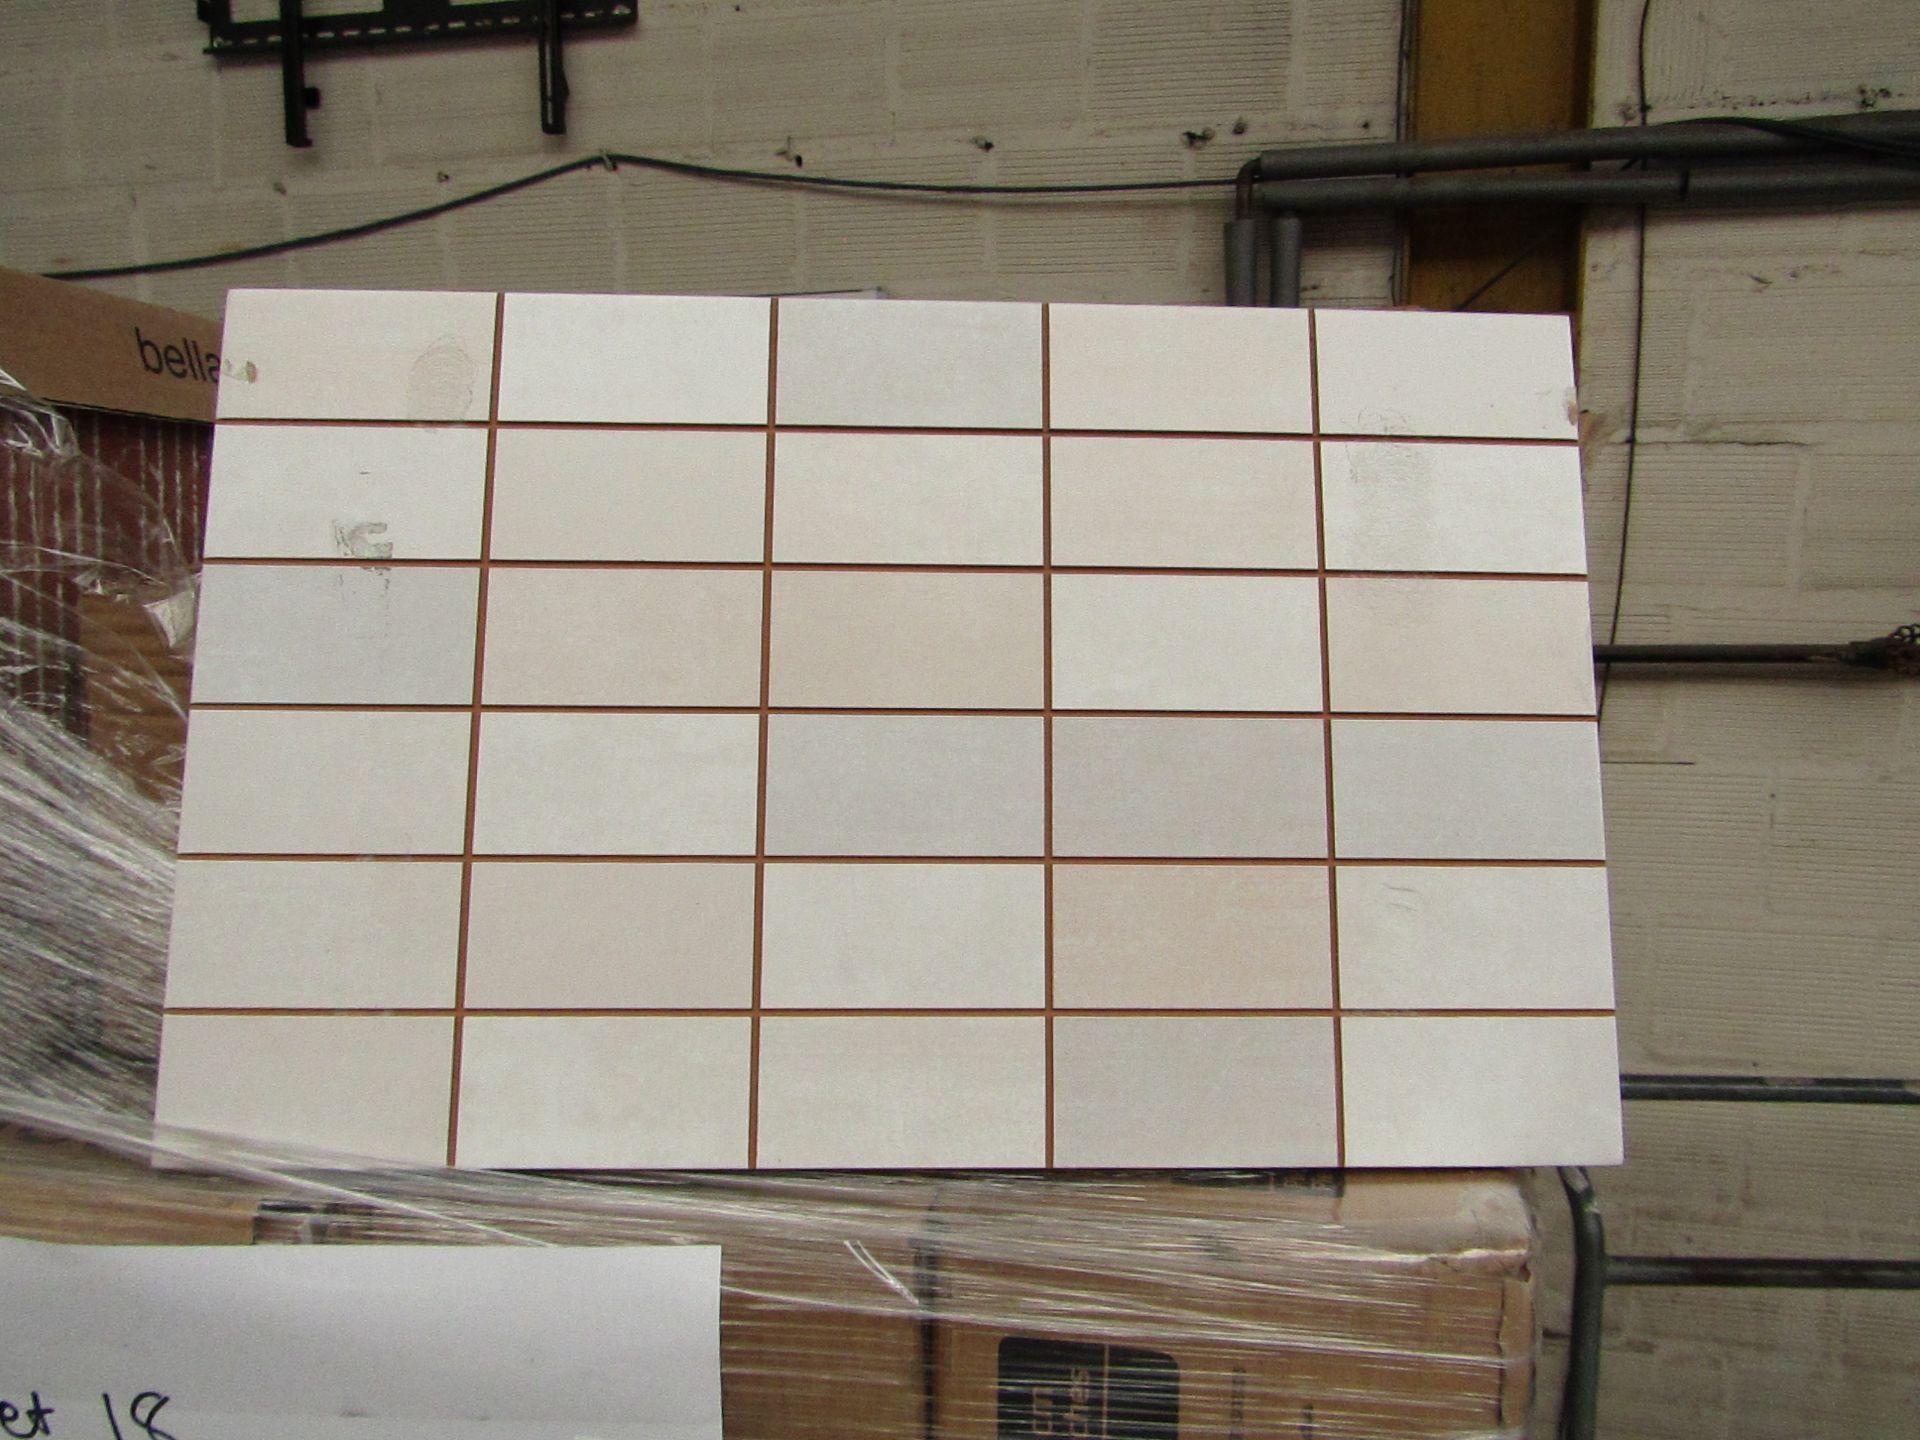 Lot 391 - 10x packs of 17 Bella Vista Freya Cream mosaic tiles 400x250, RRP £16.66 giving a total lot RRP of